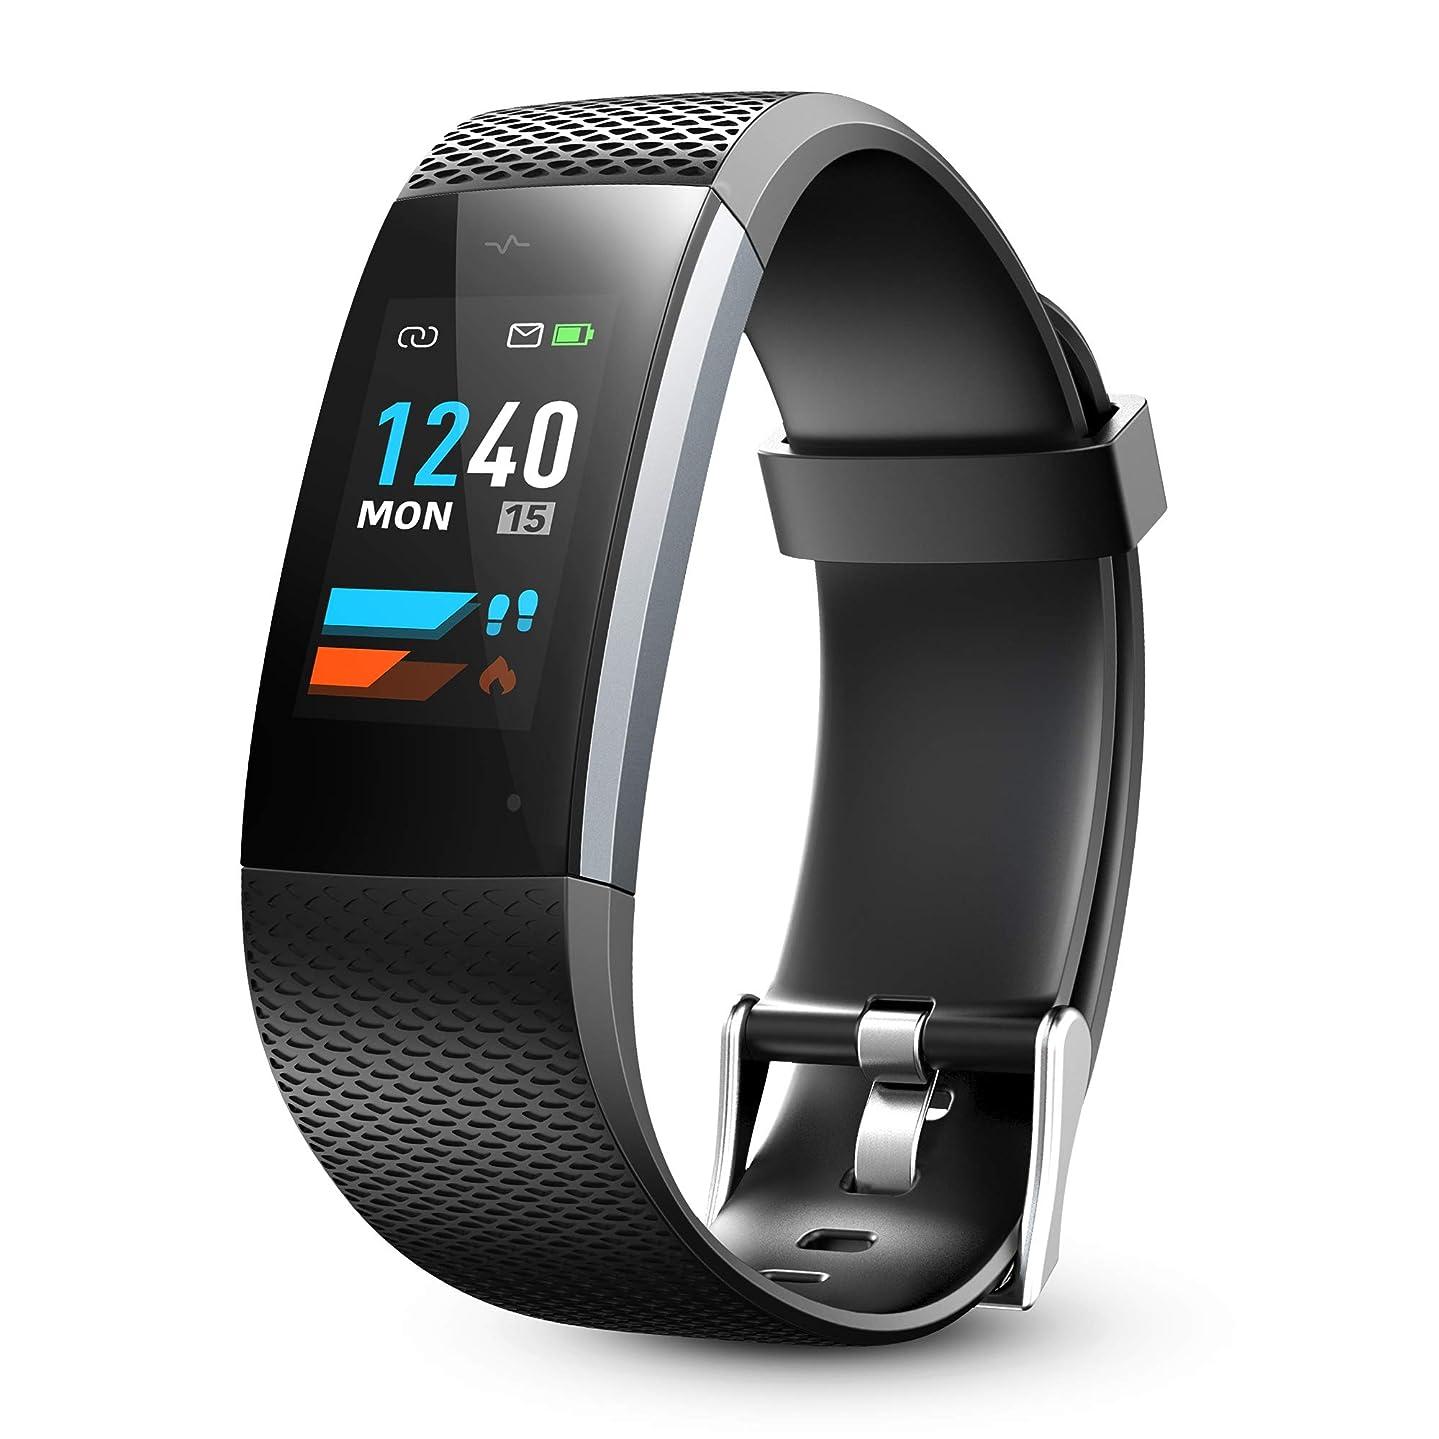 Lenovo Fitness Tracker, Original Fitness Tracker Heart Rate Monitor, Color Screen Sport Smart Watch, IP67 Waterproof Activity Tracker, Step Calorie Counter Women Men